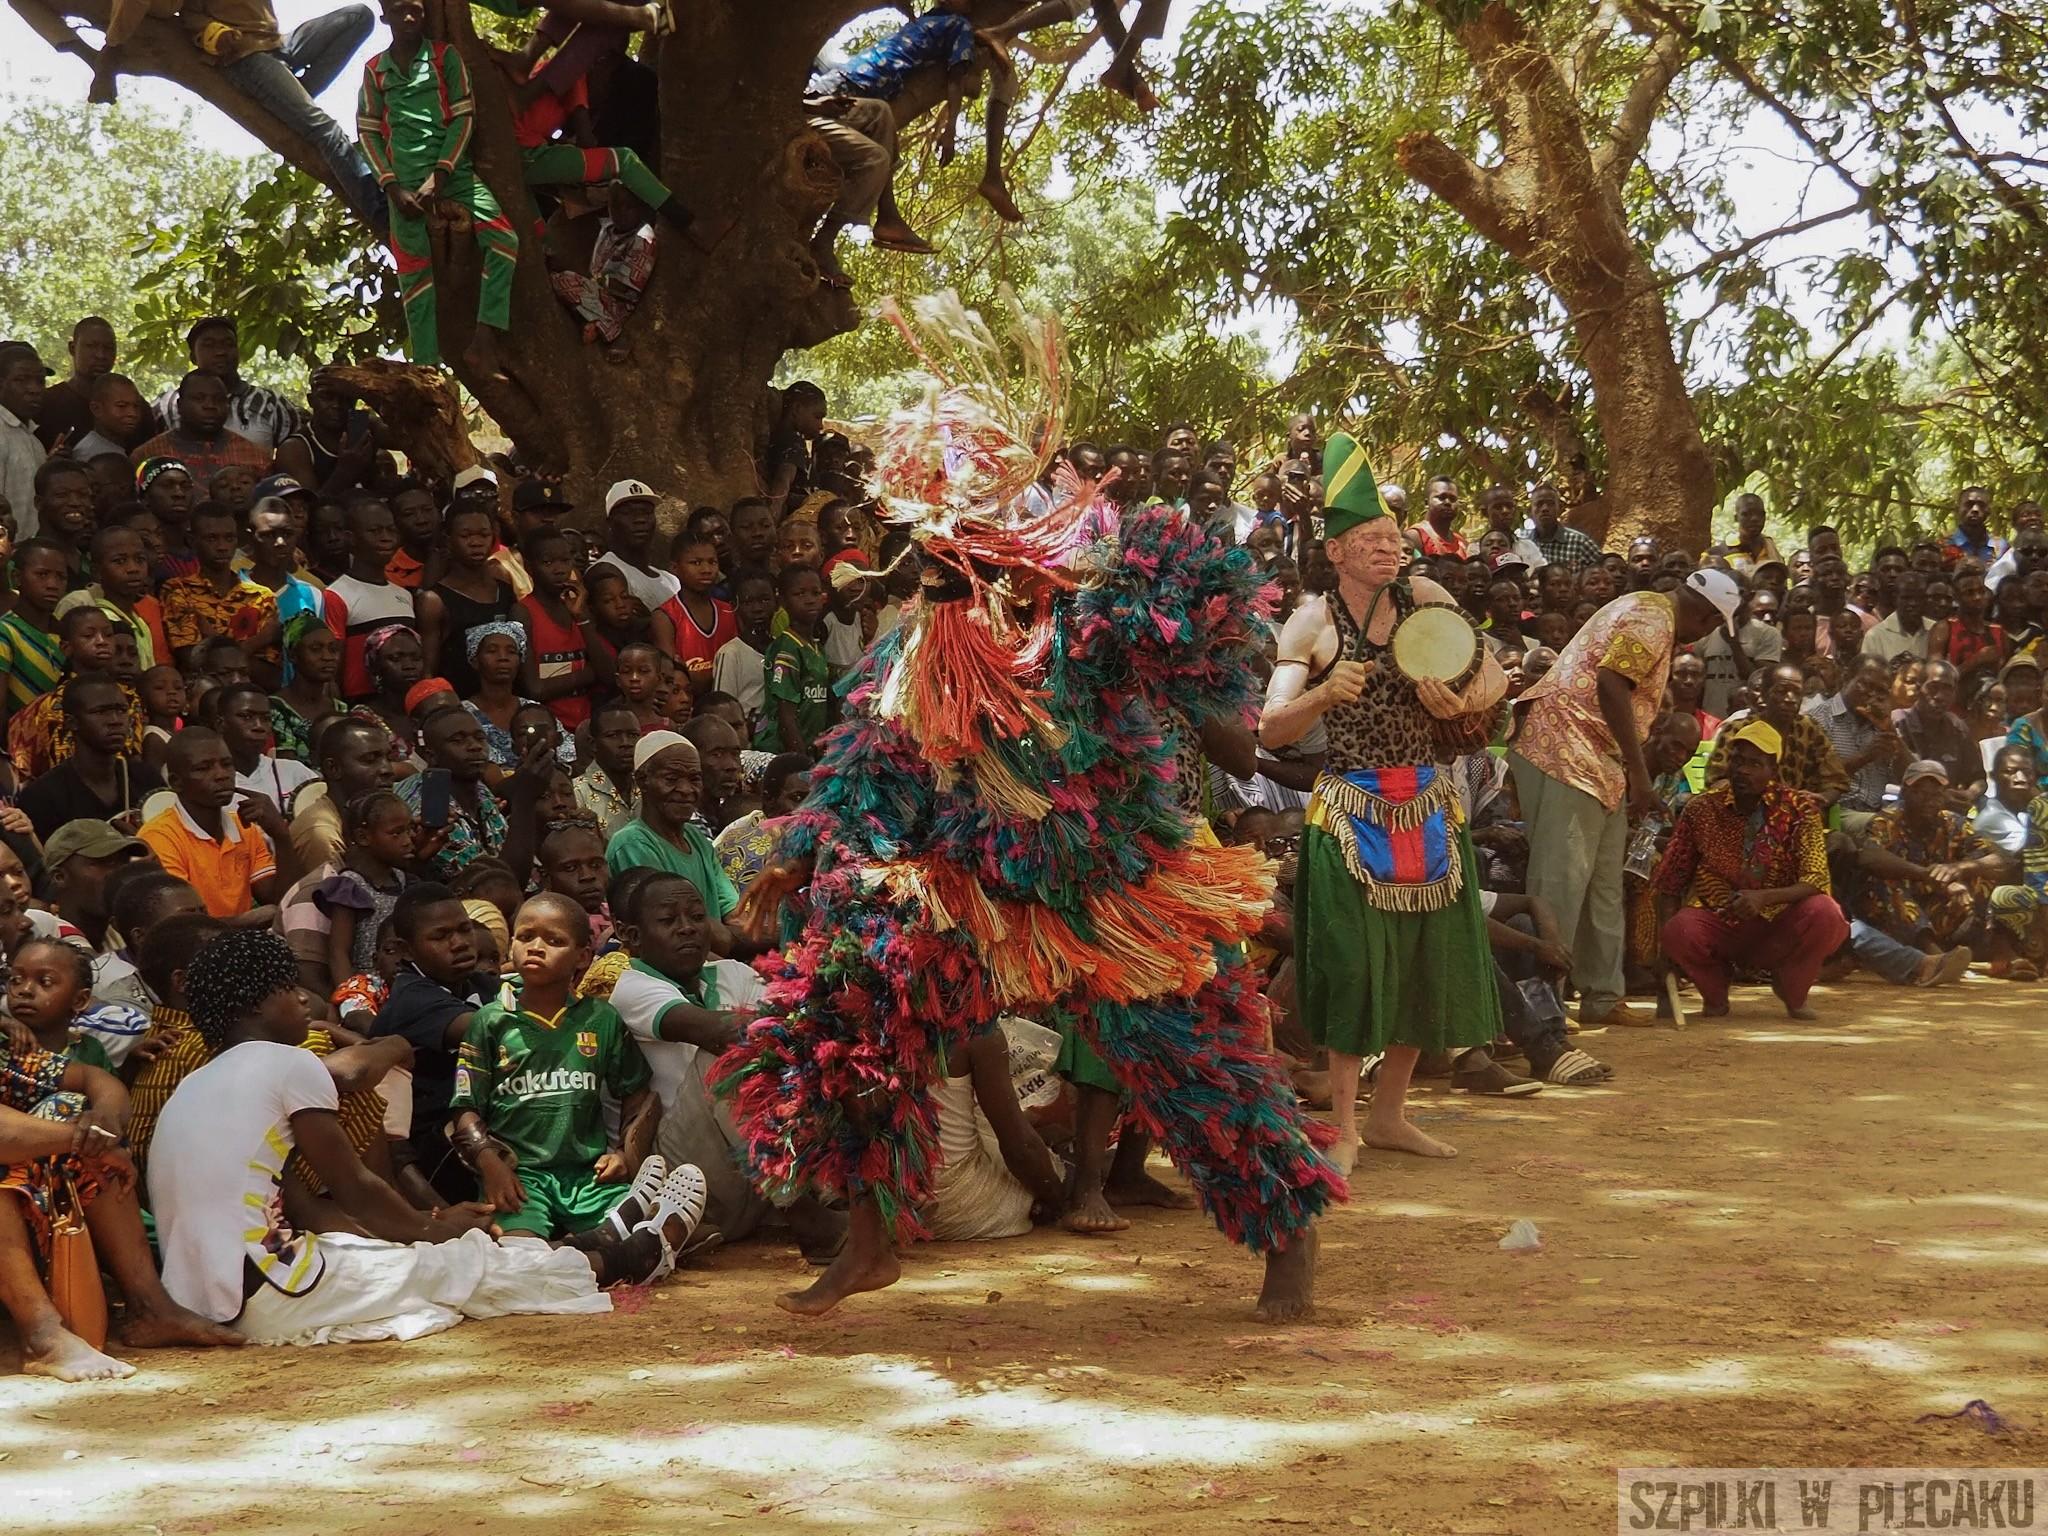 Mask Festiwal Burkina Faso - Maskarada 2019